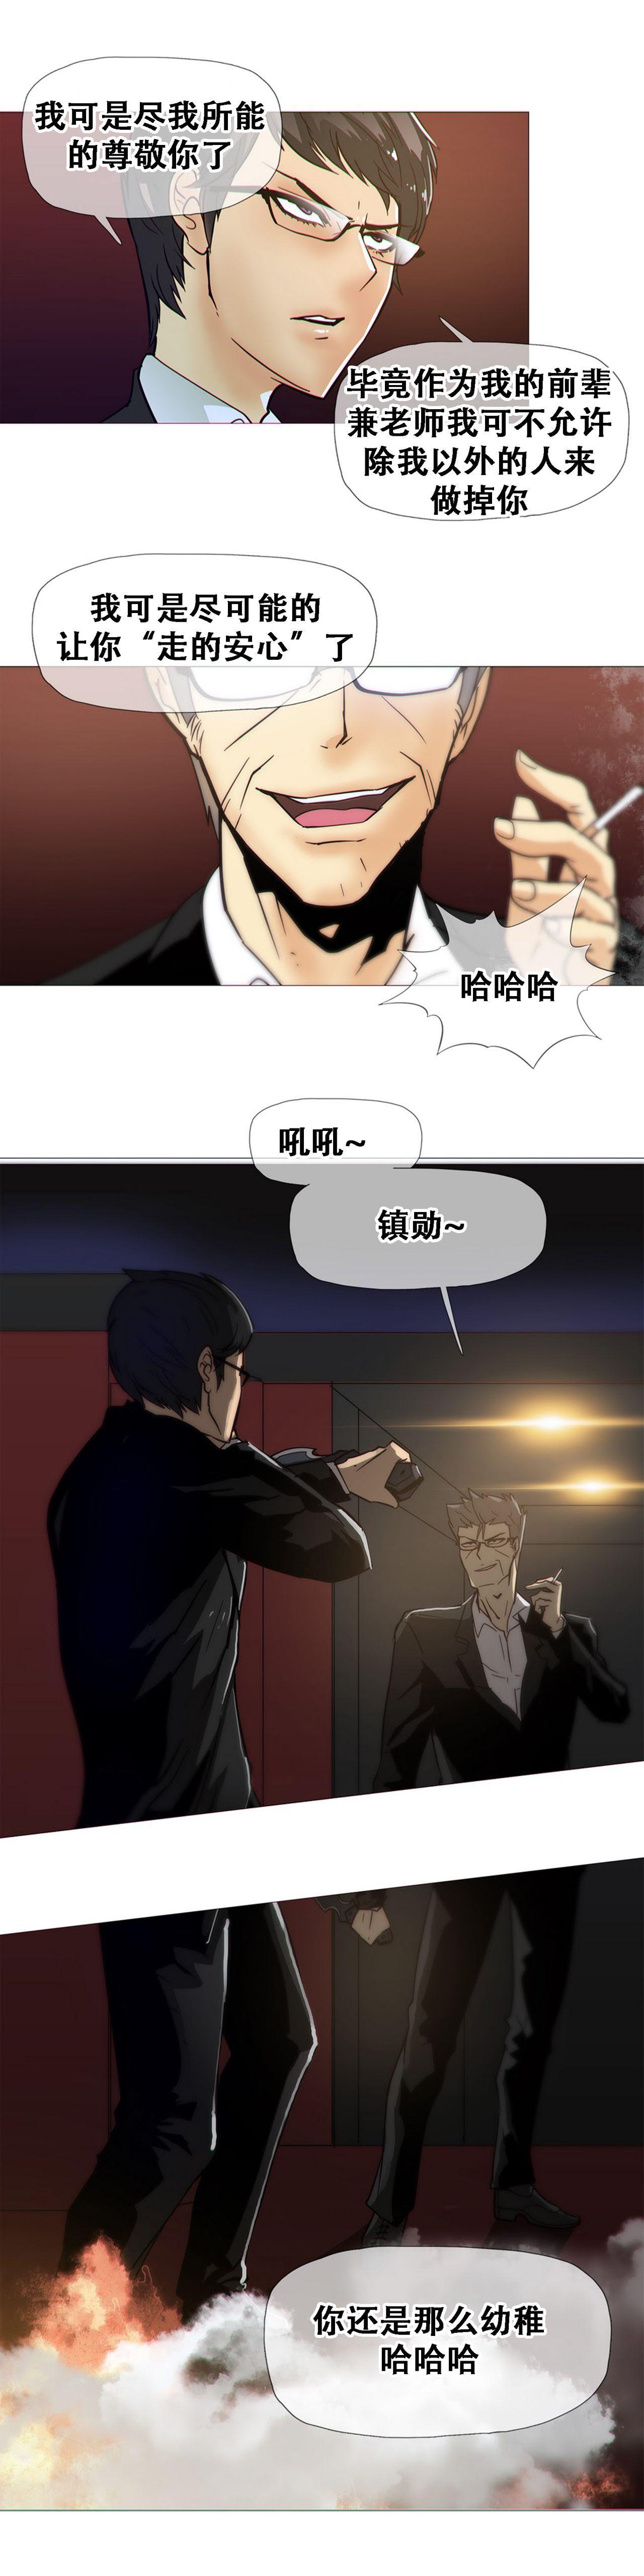 HouseHold Affairs 【卞赤鲤个人汉化】1~33话(持续更新中) 360